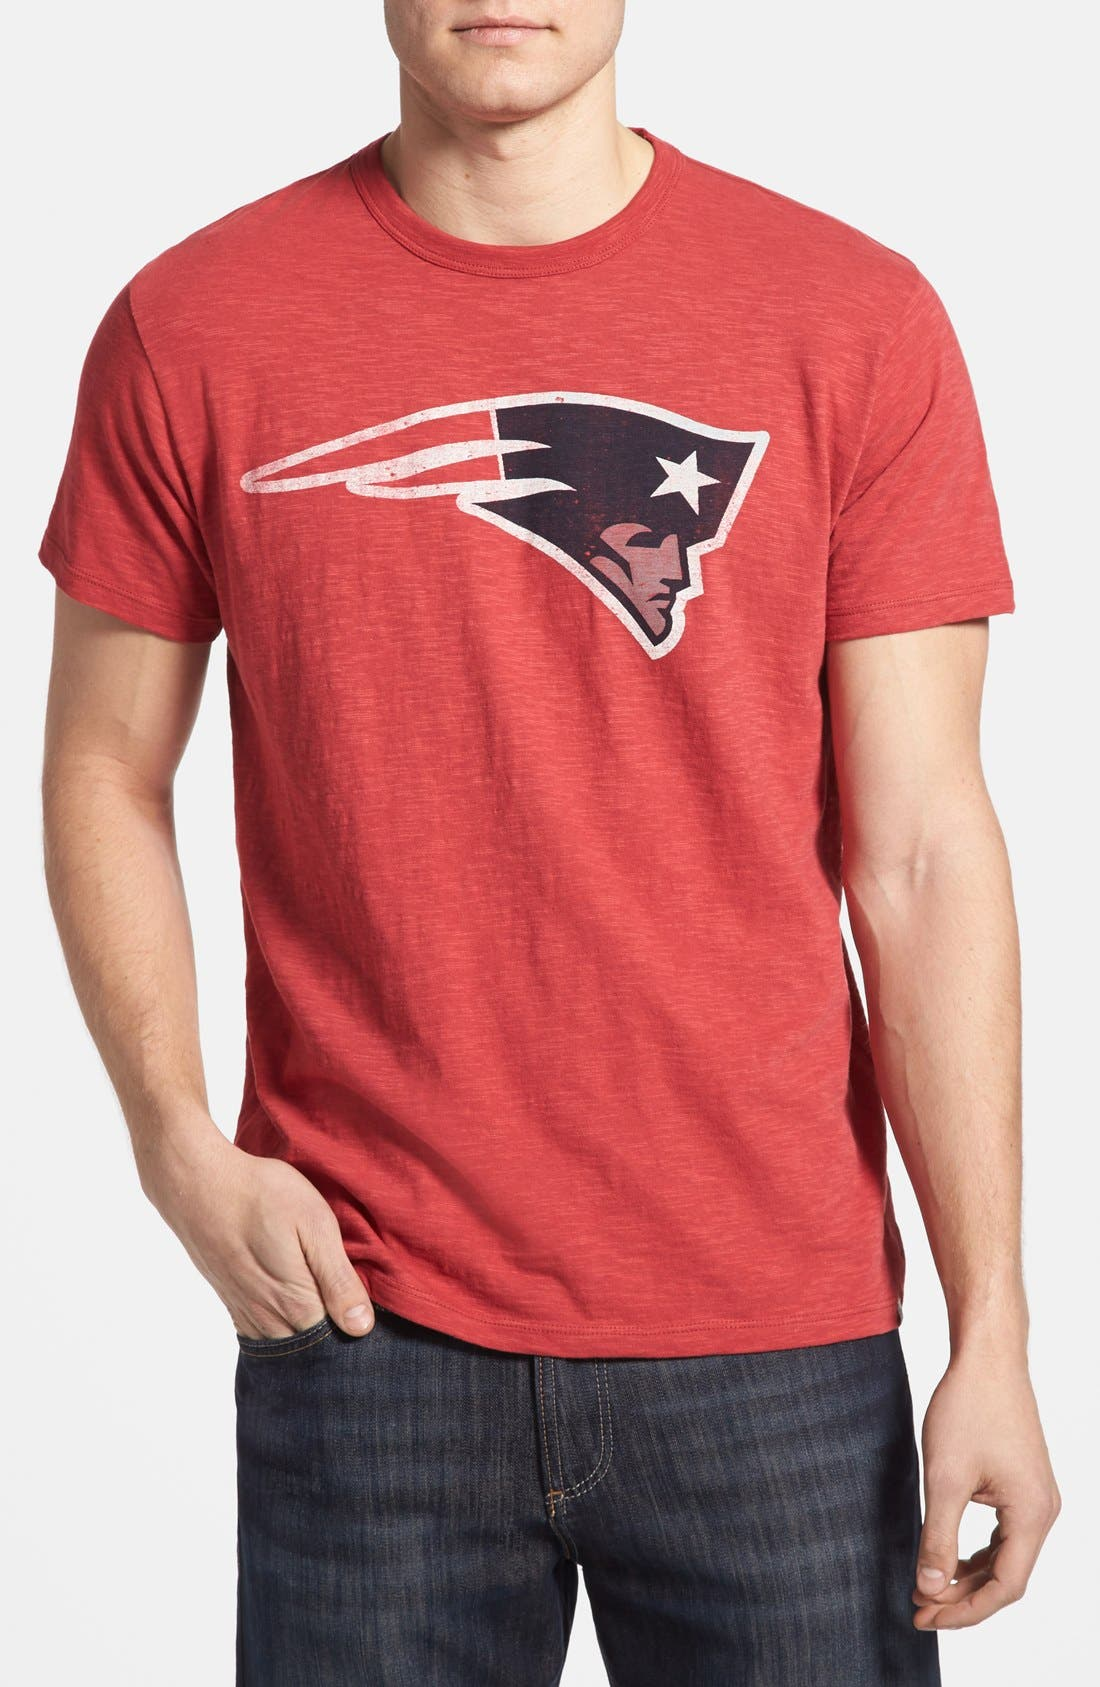 Main Image - 47 Brand 'New England Patriots - Scrum' Graphic T-Shirt